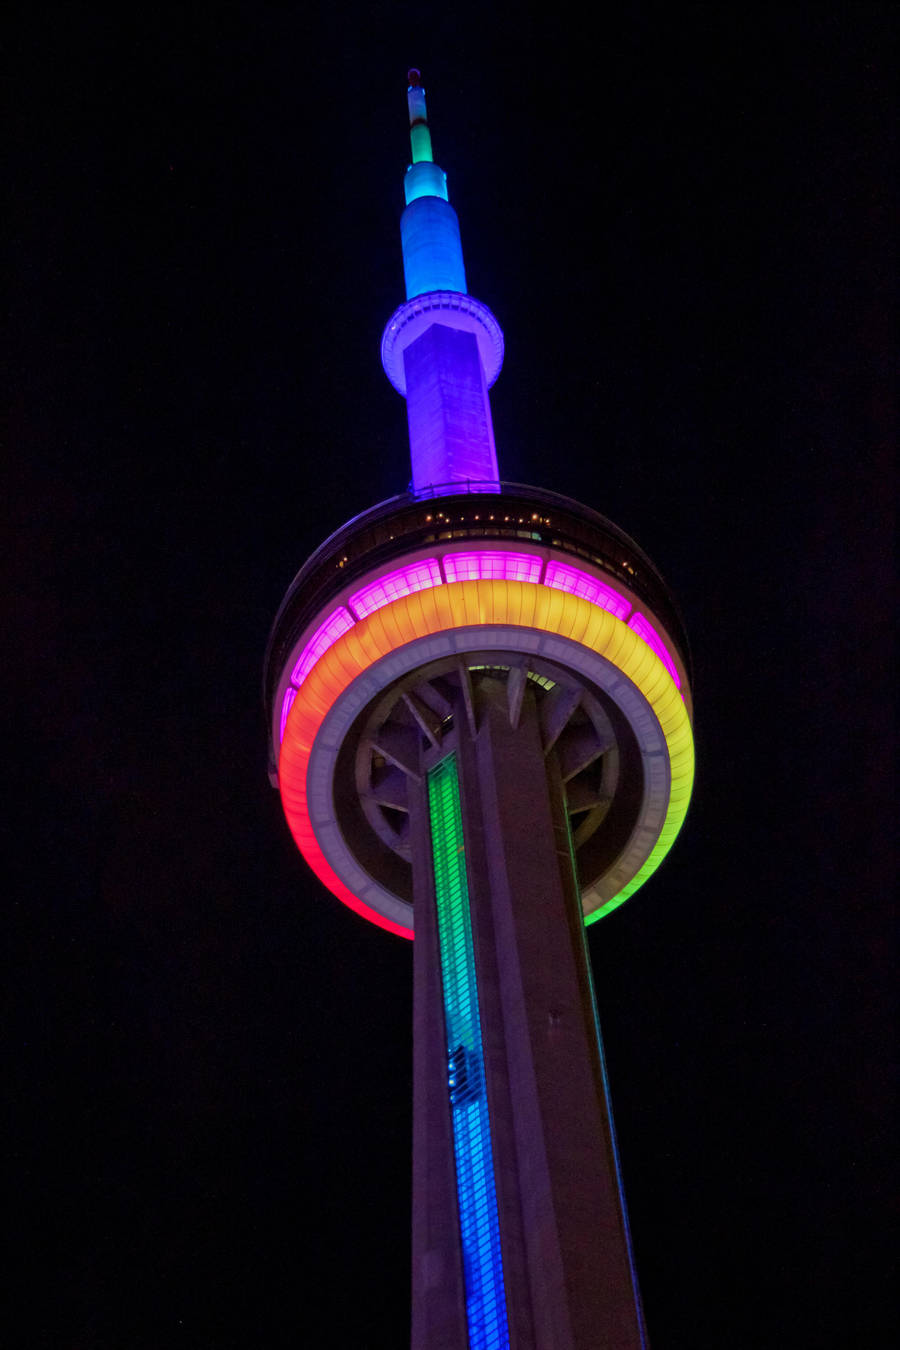 Rainbow CN Tower by vmulligan